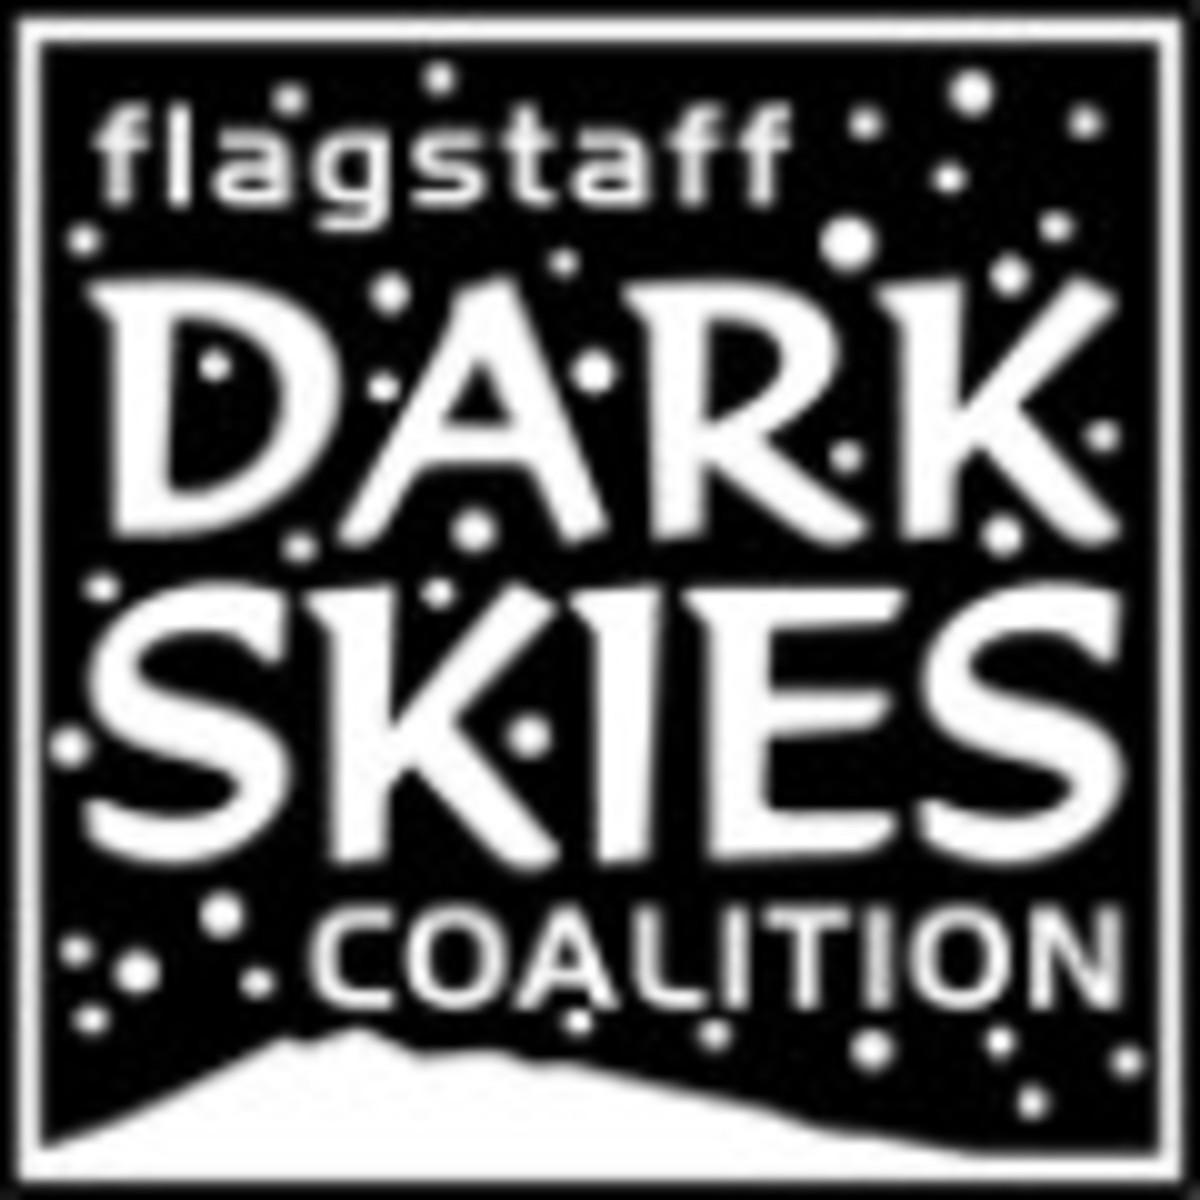 Flagstaff Dark Skies